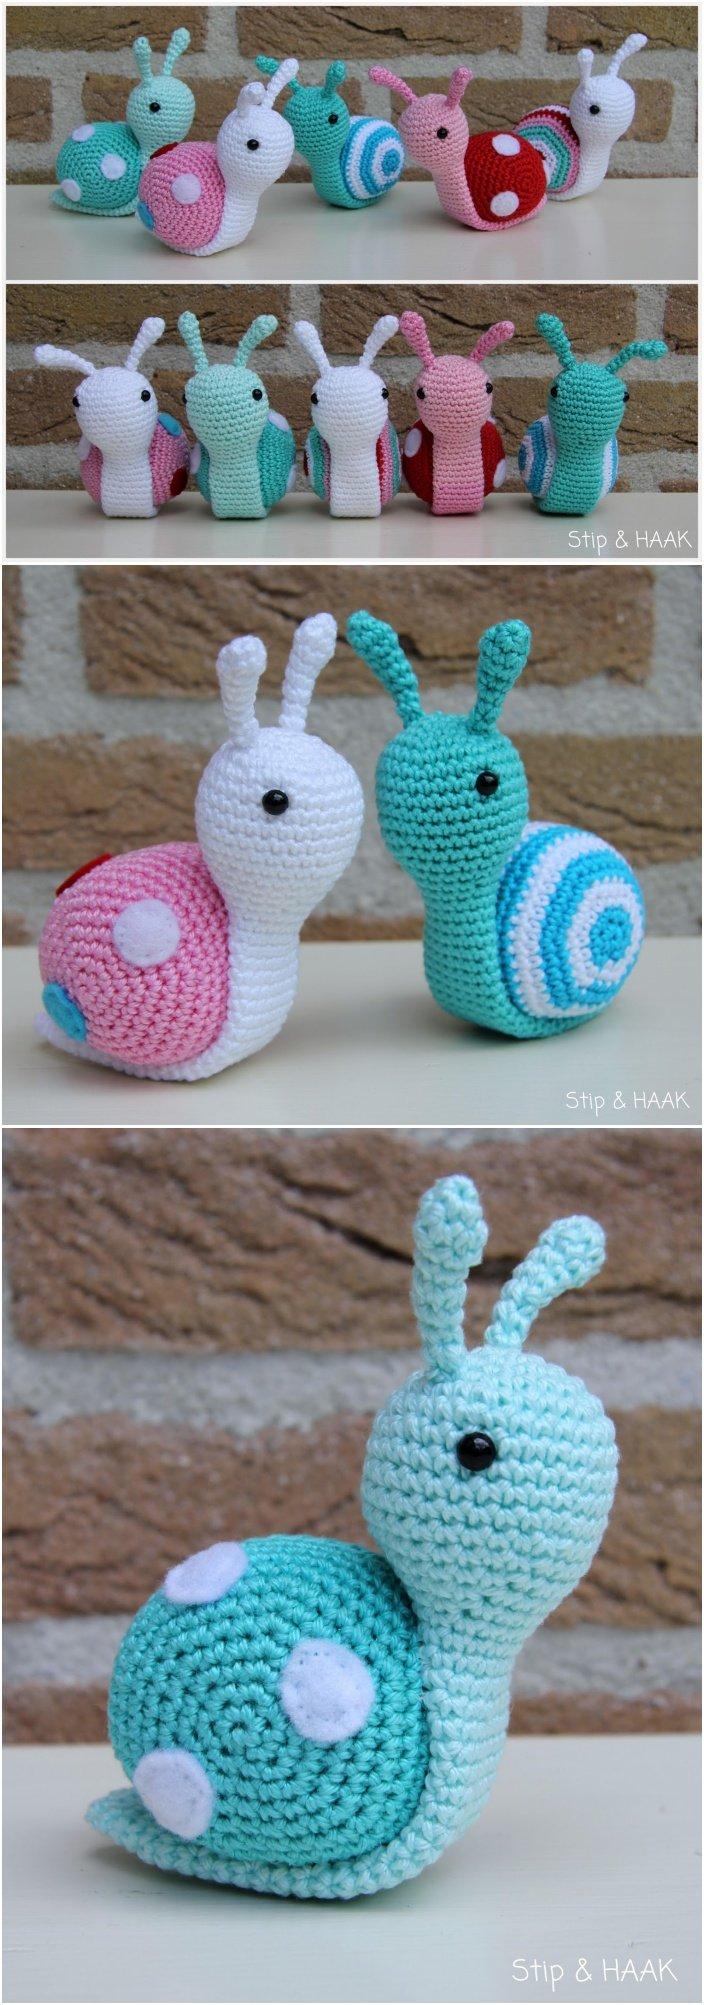 How To Crochet A Amigurumi : Crochet Amigurumi Snail Patterns